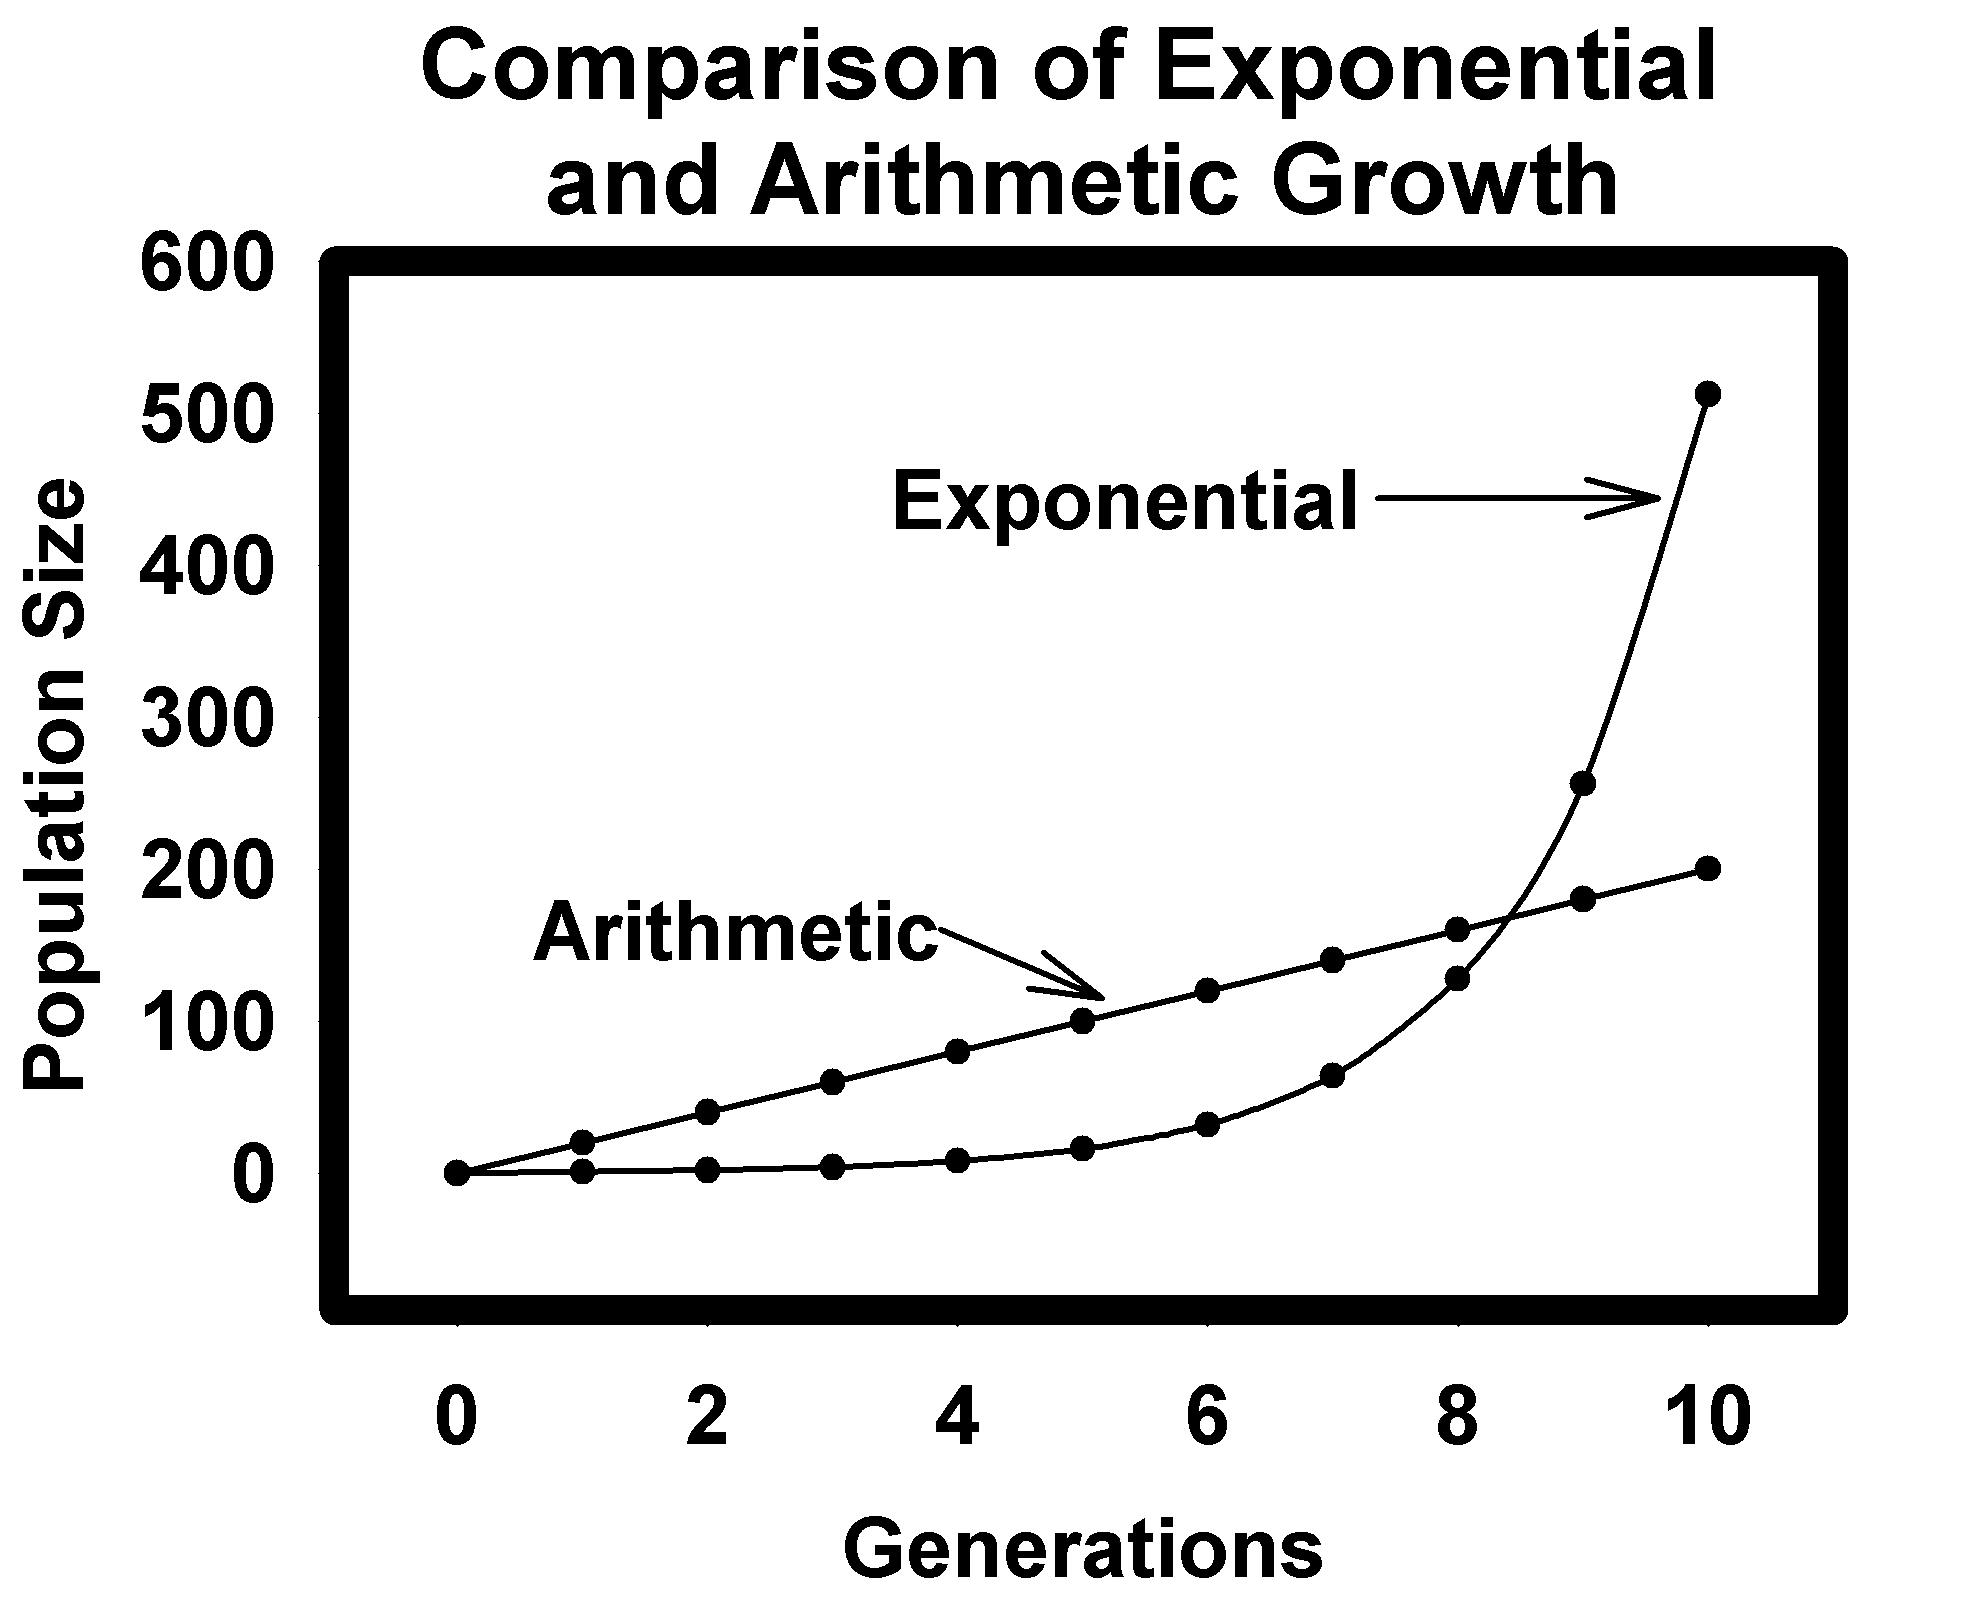 005 Malthusgrowthcurves Jpg Essay Example On The Principle Of Singular Population Pdf By Thomas Malthus Main Idea Full